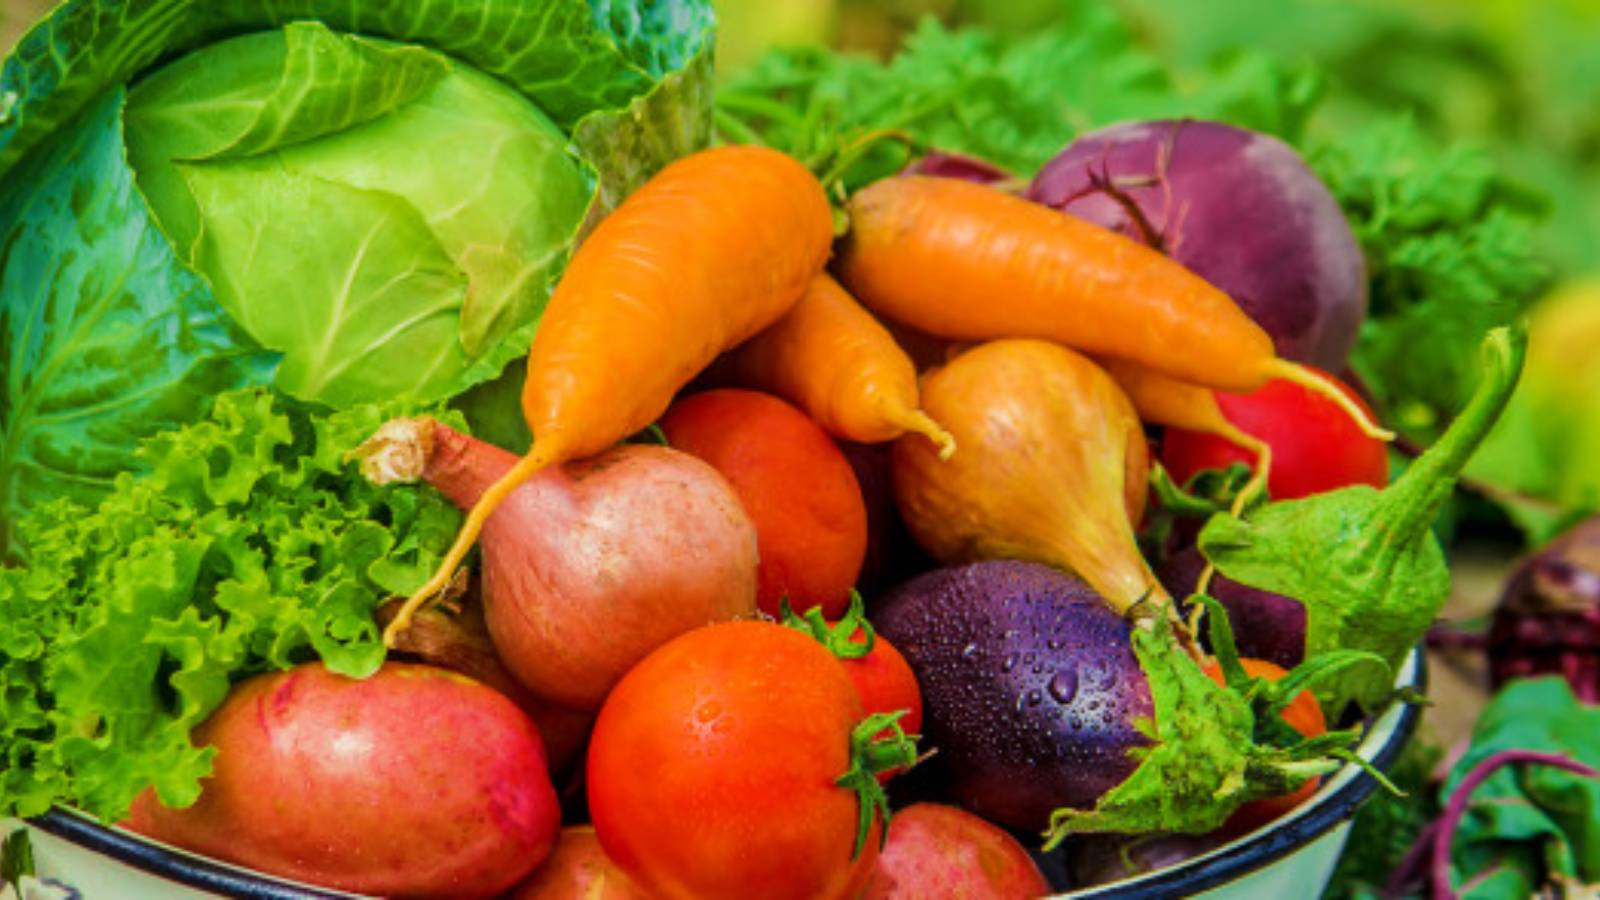 diferentes-hortalizas-bio-foto-naturaleza-alimentos_73944-7497